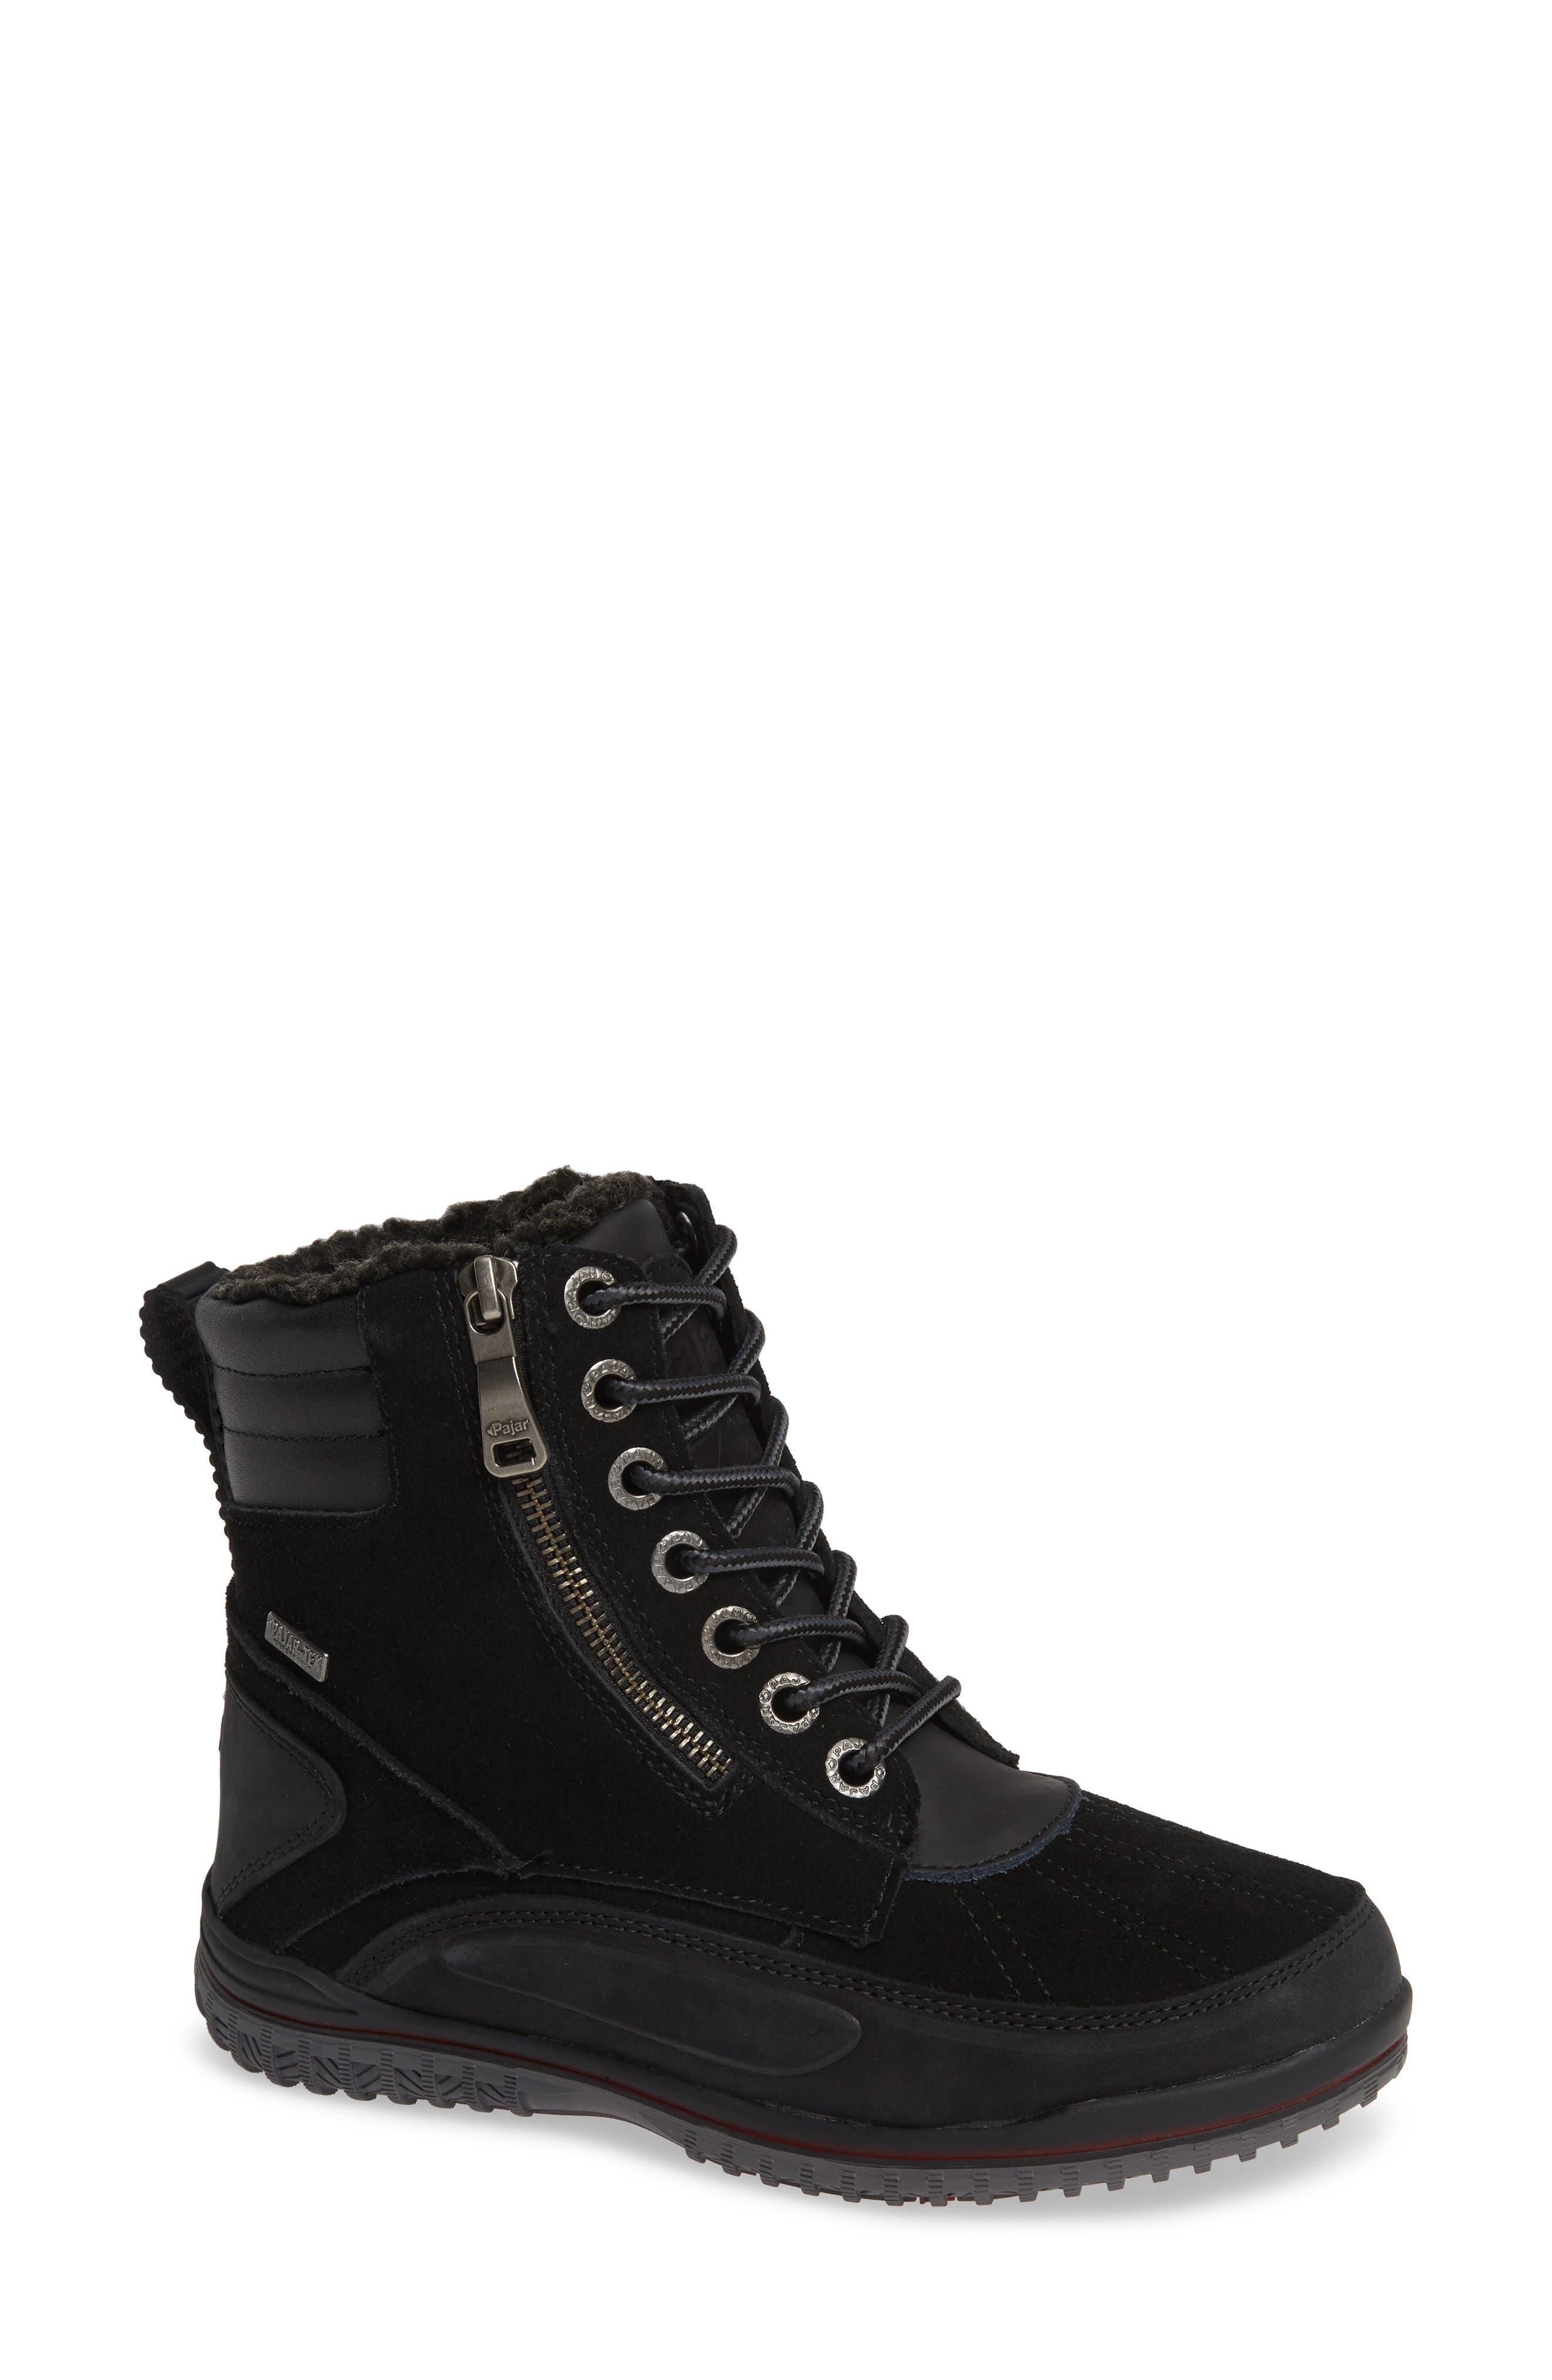 Pajar Jeana Waterproof Winter Boot, Black